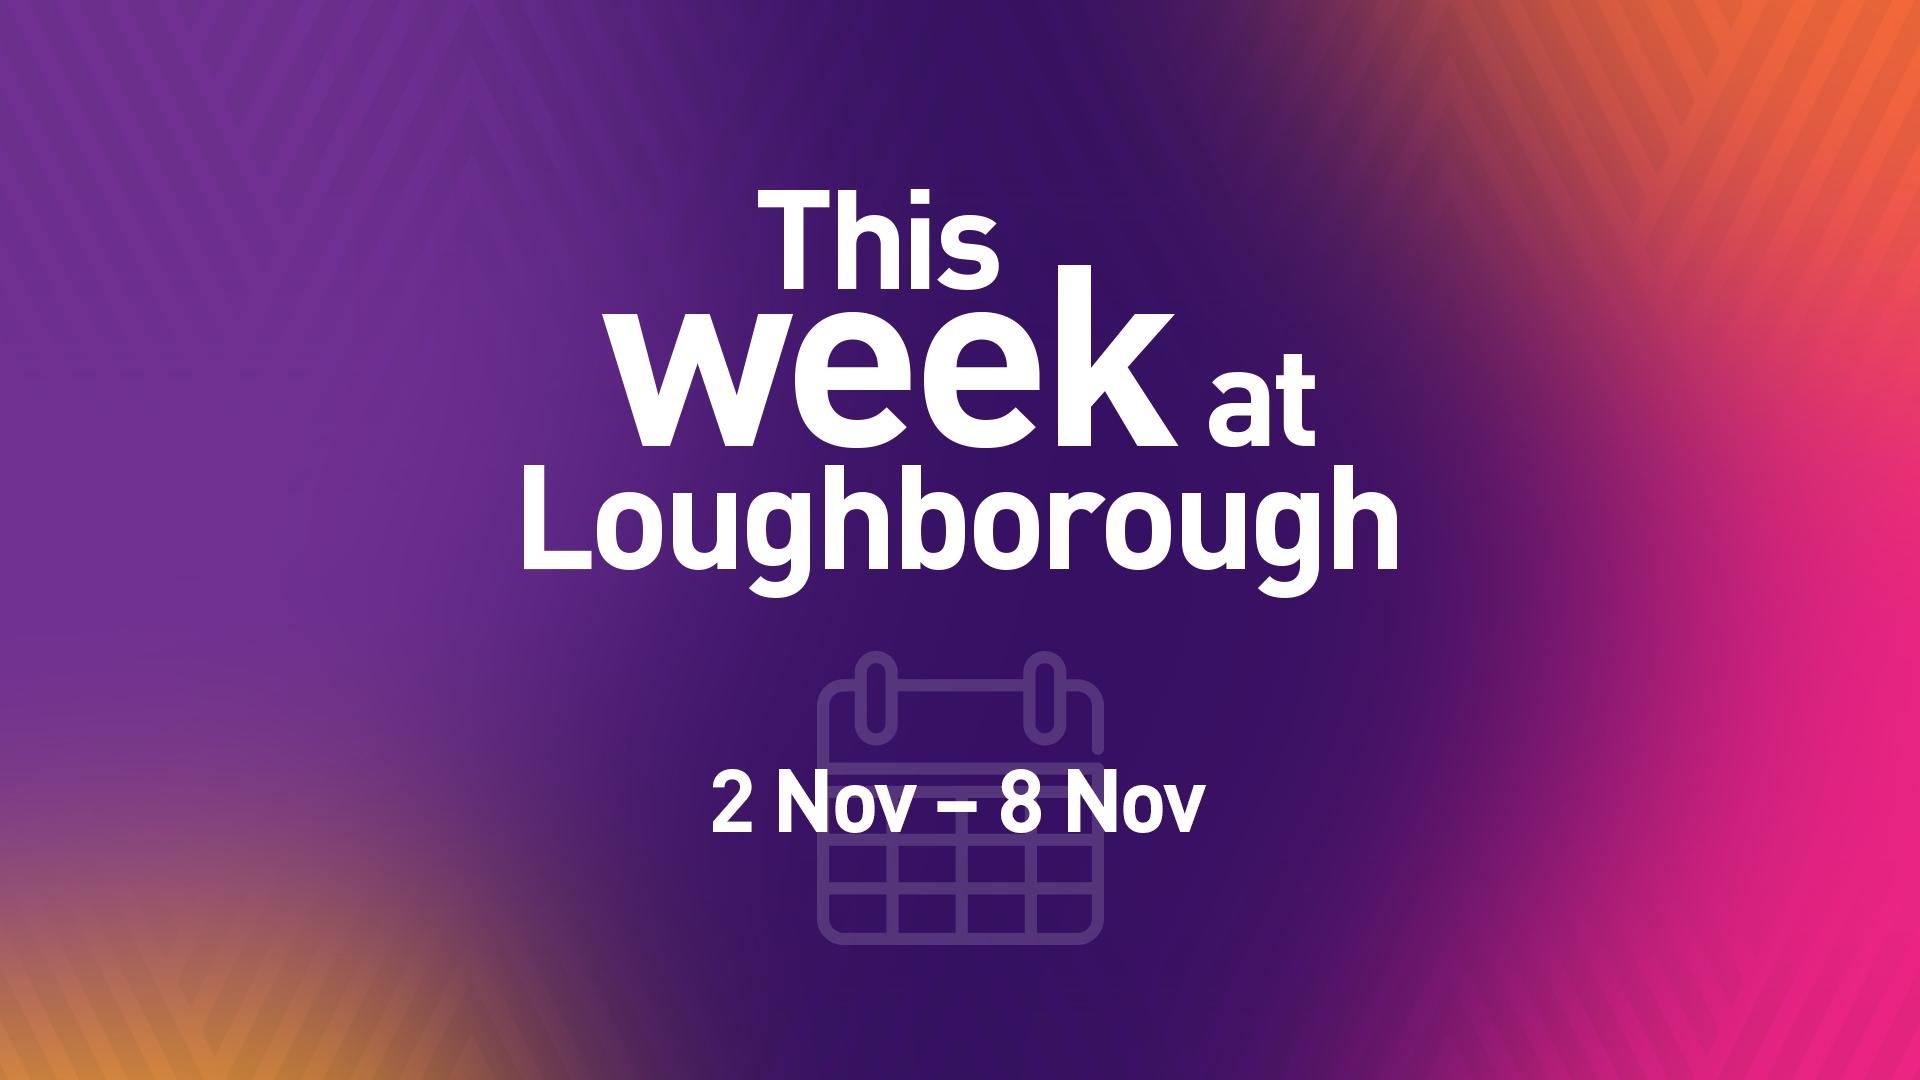 This Week at Loughborough | 2 November